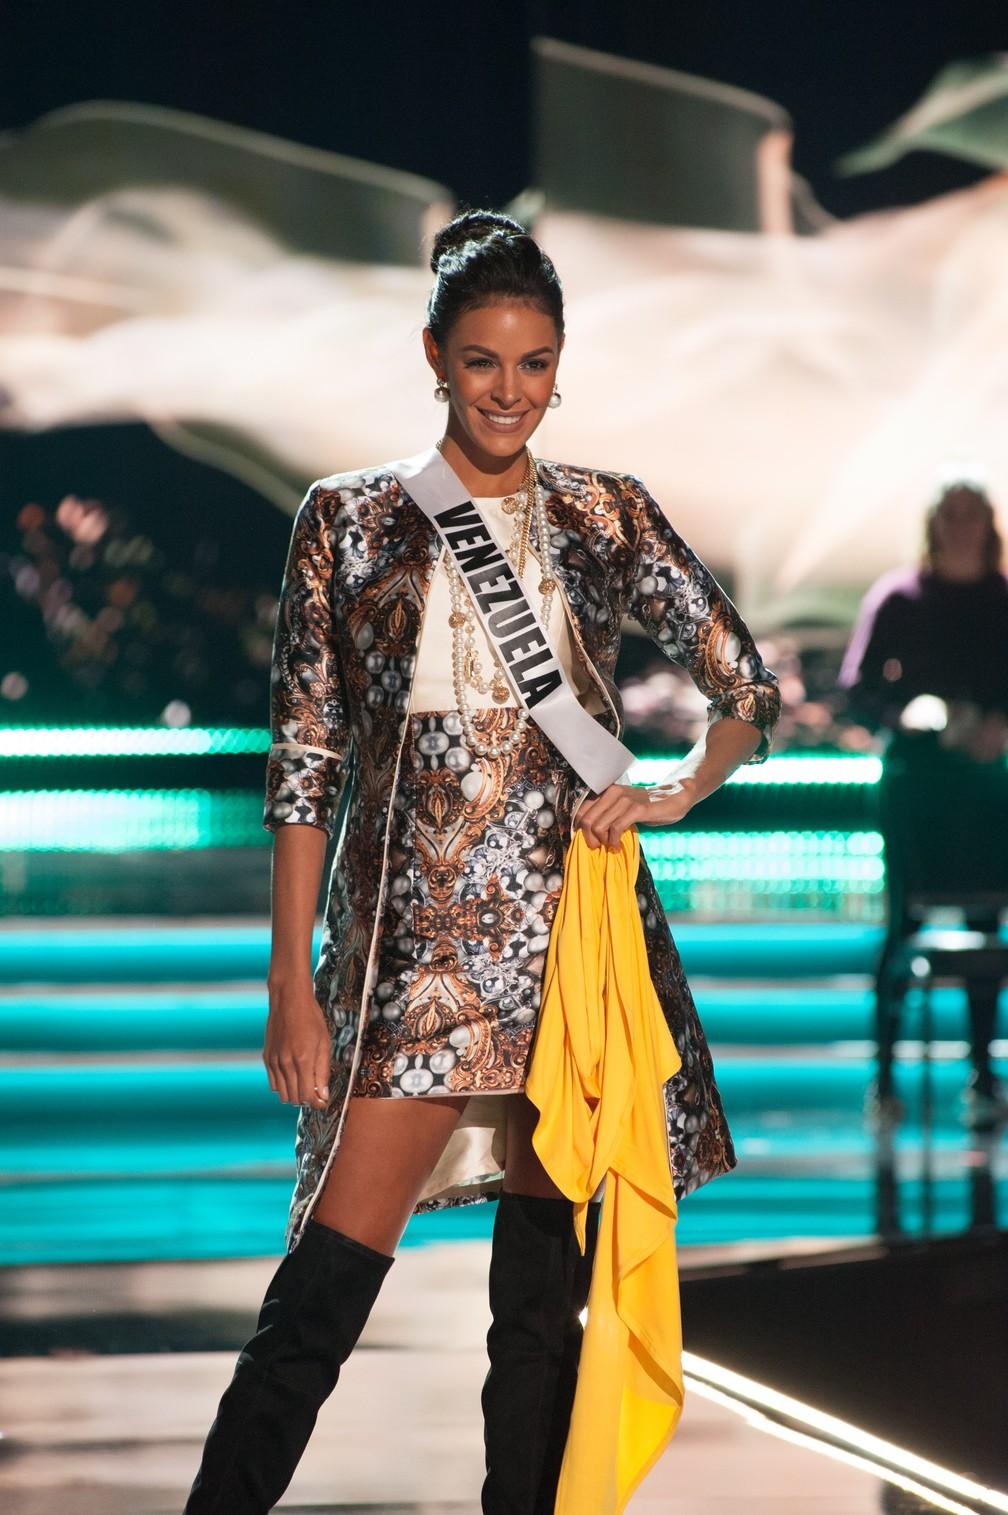 Keysi Sayago, Miss Venezuela (Foto: Patrick Prather/Miss Universe Organization/AFP)